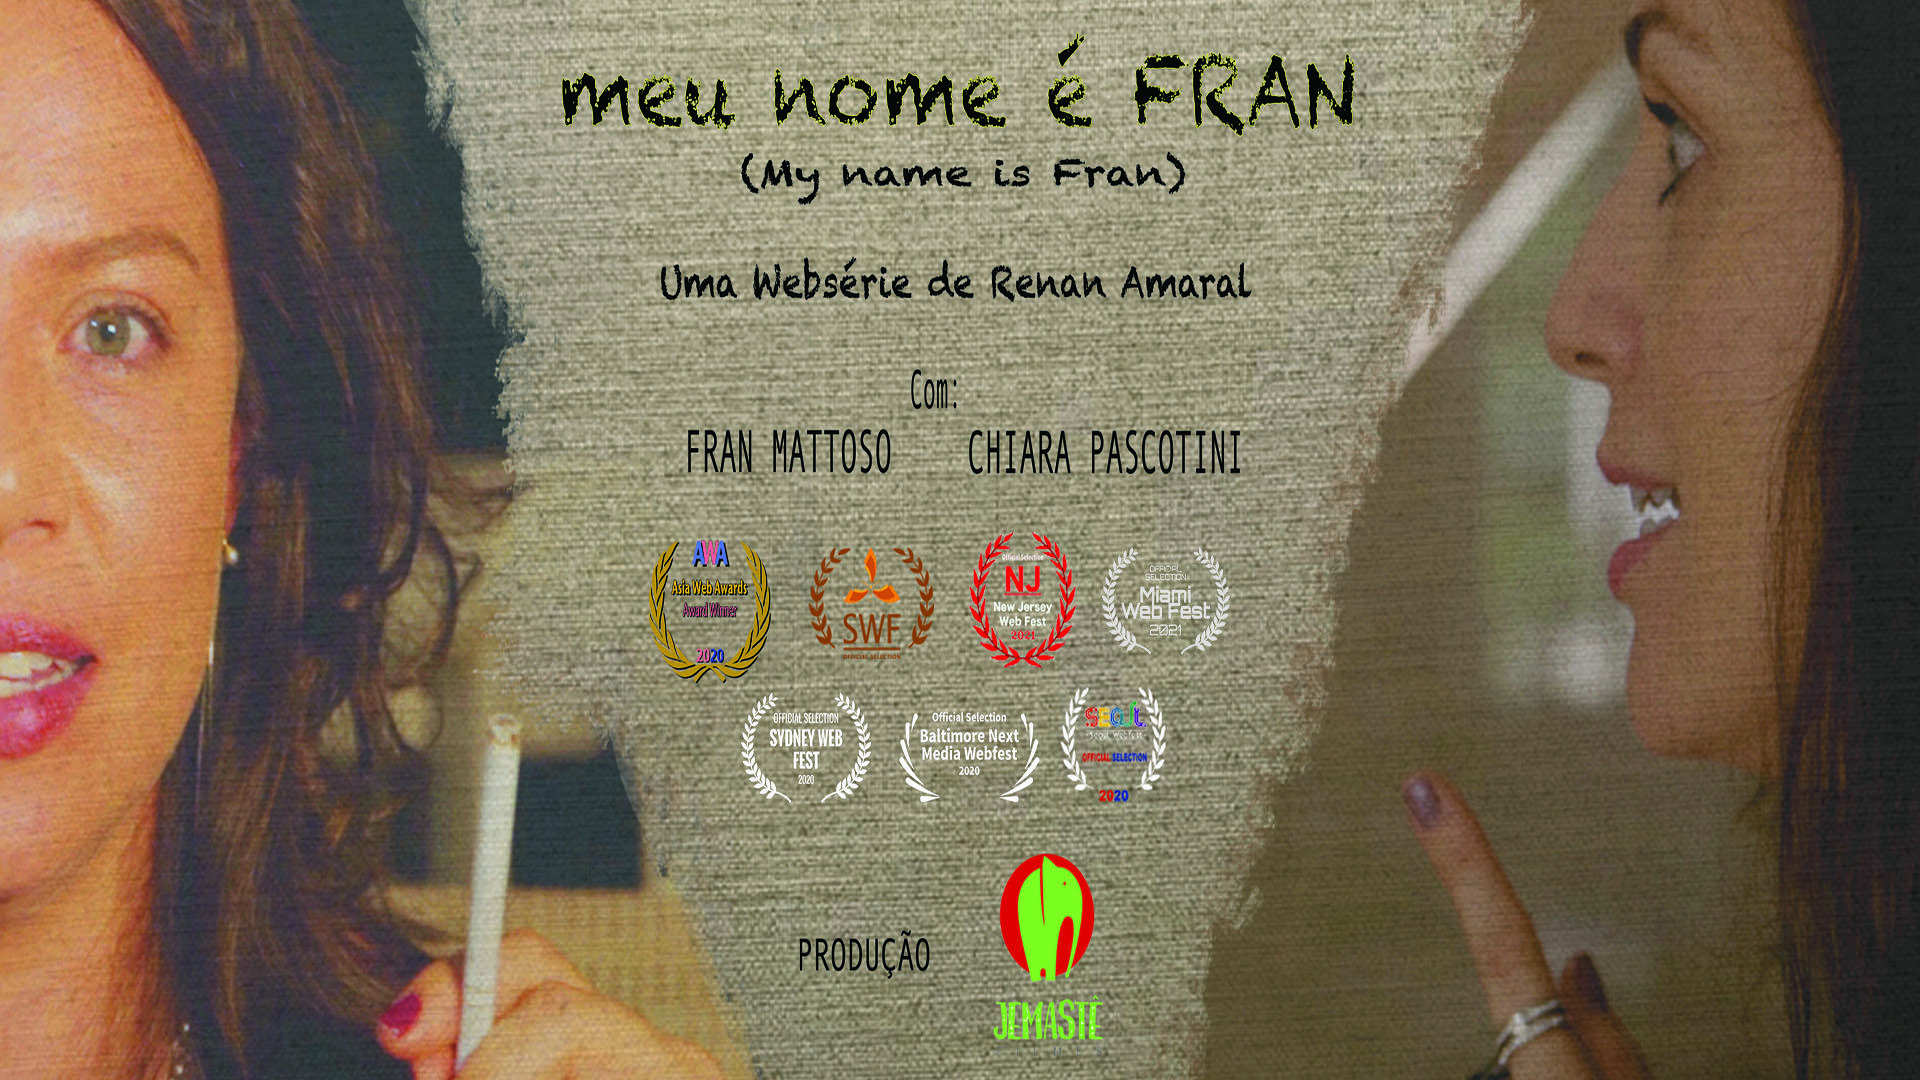 My name is FRAN